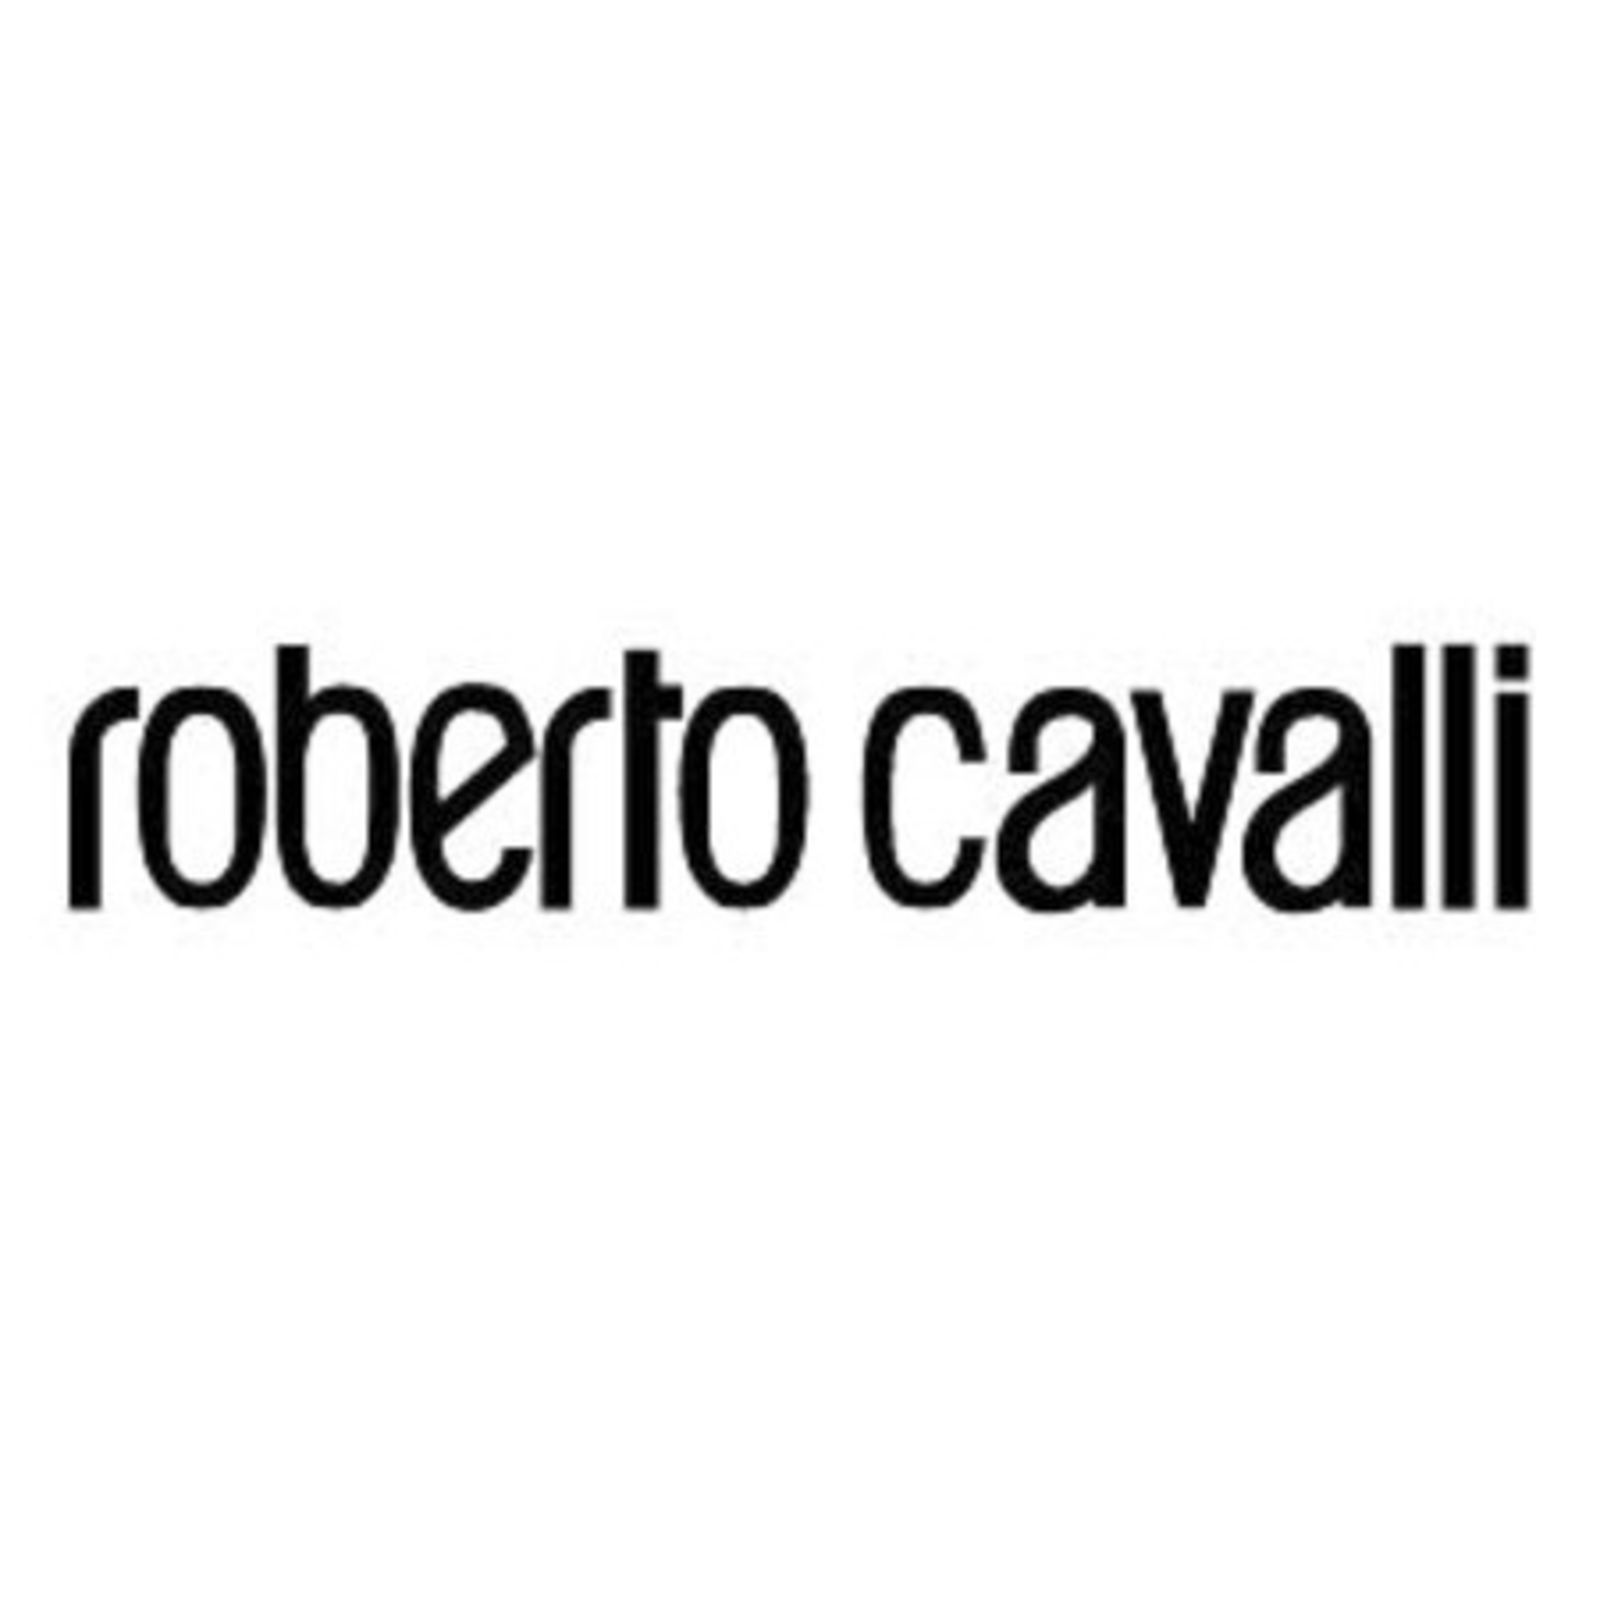 Roberto Cavalli (Image 1)